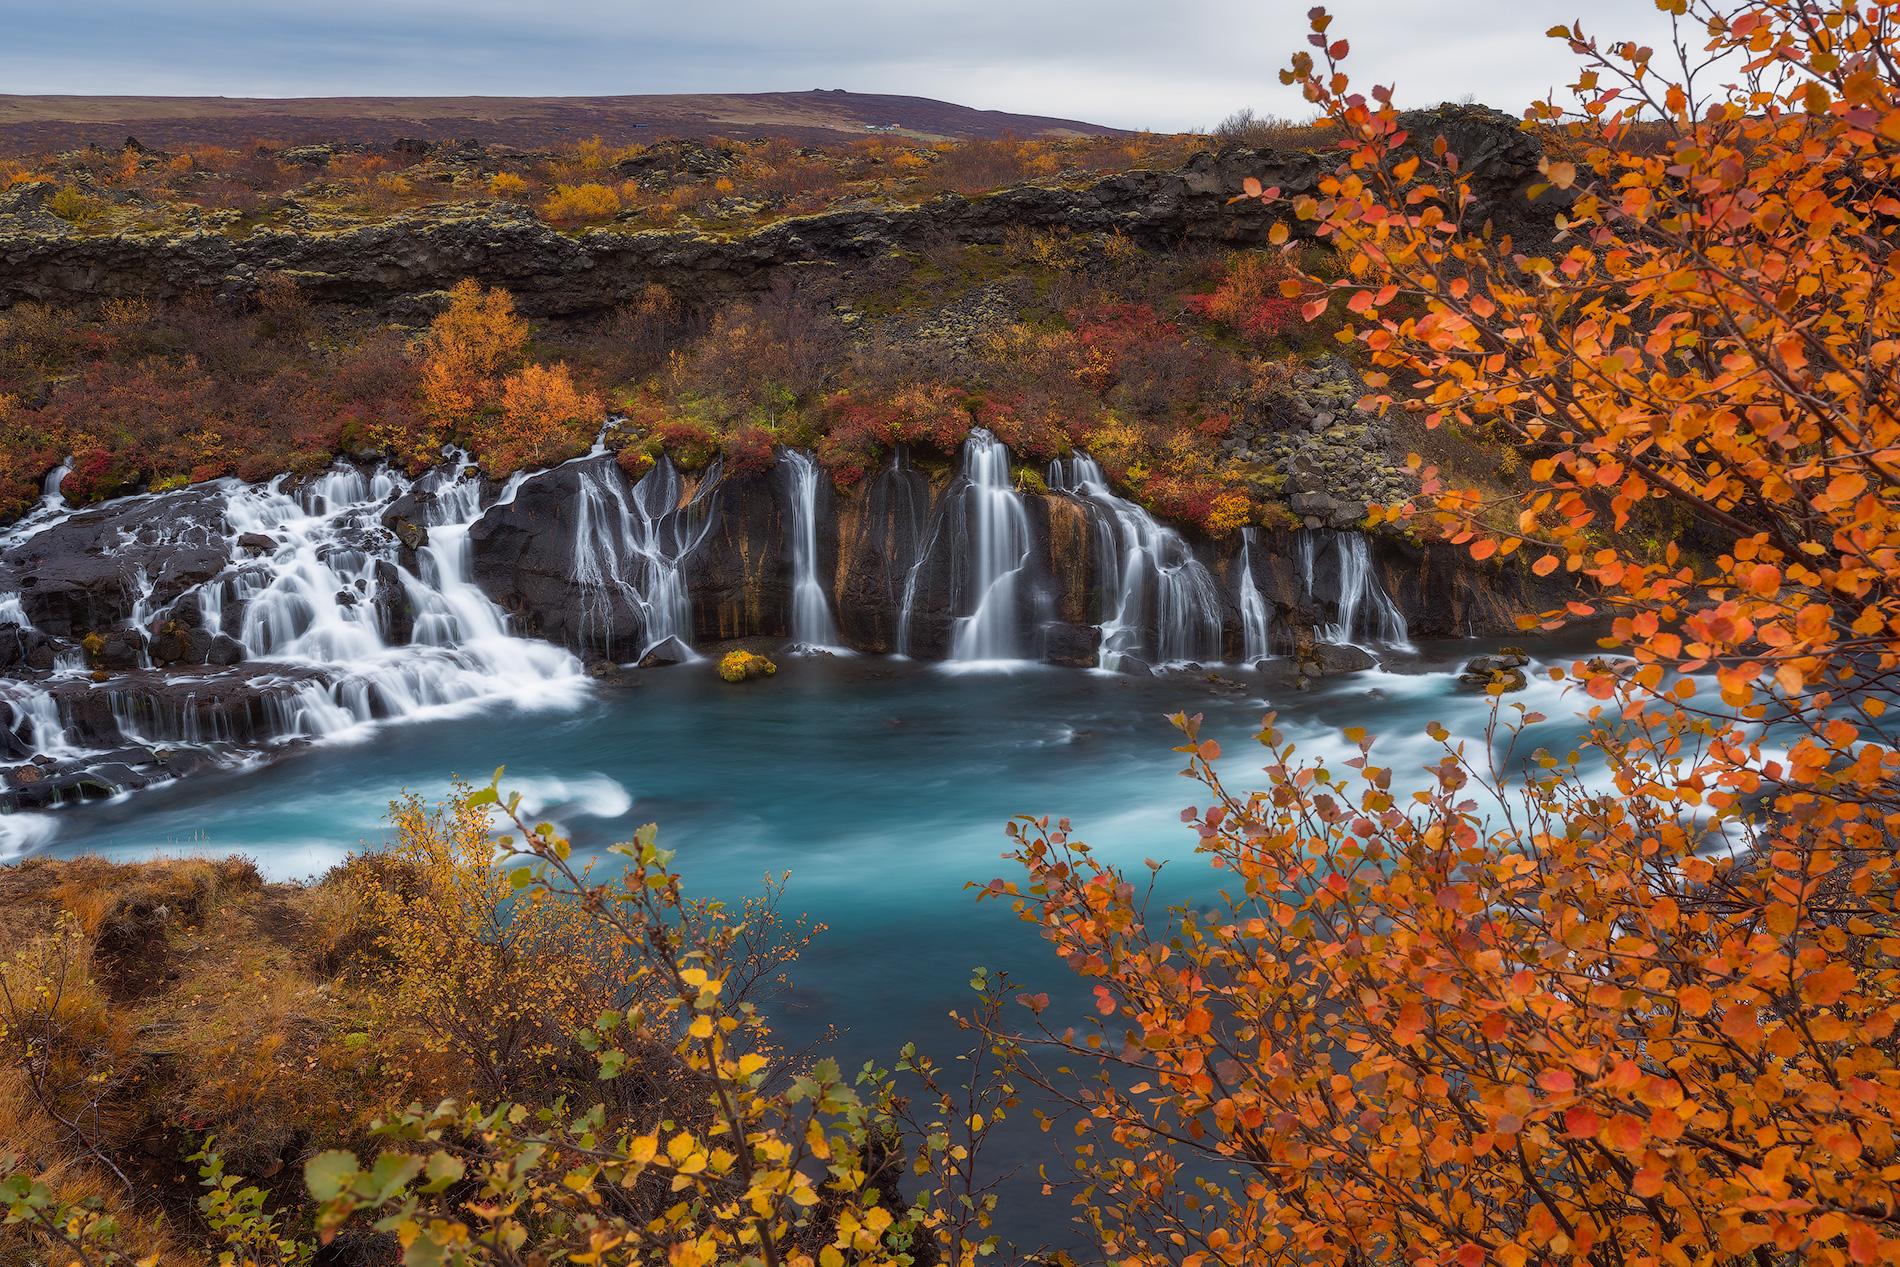 Hraunfossar瀑布位于冰岛西部,它是一系列平缓流动的小溪。